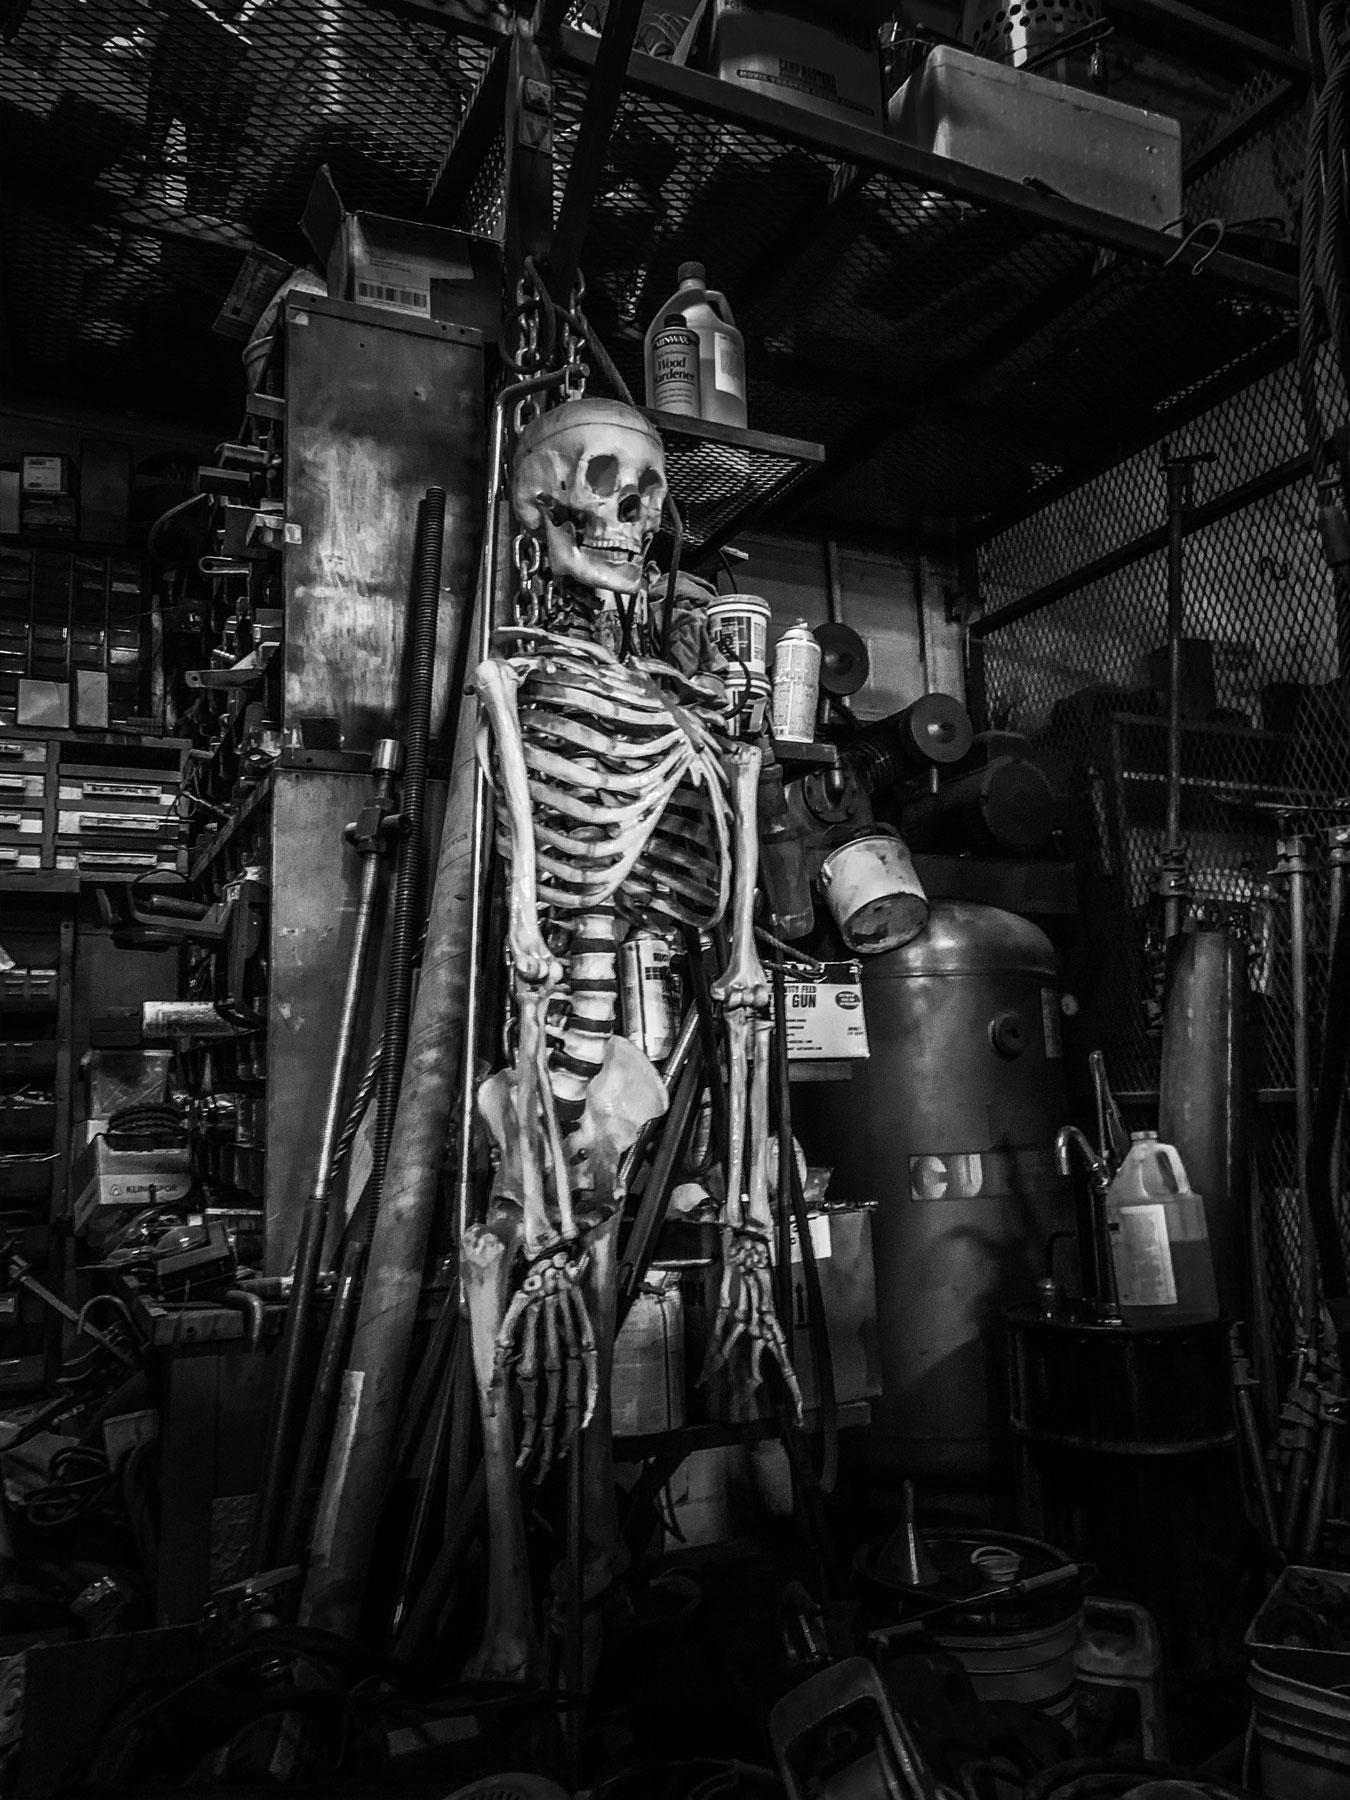 Frank the skeleton